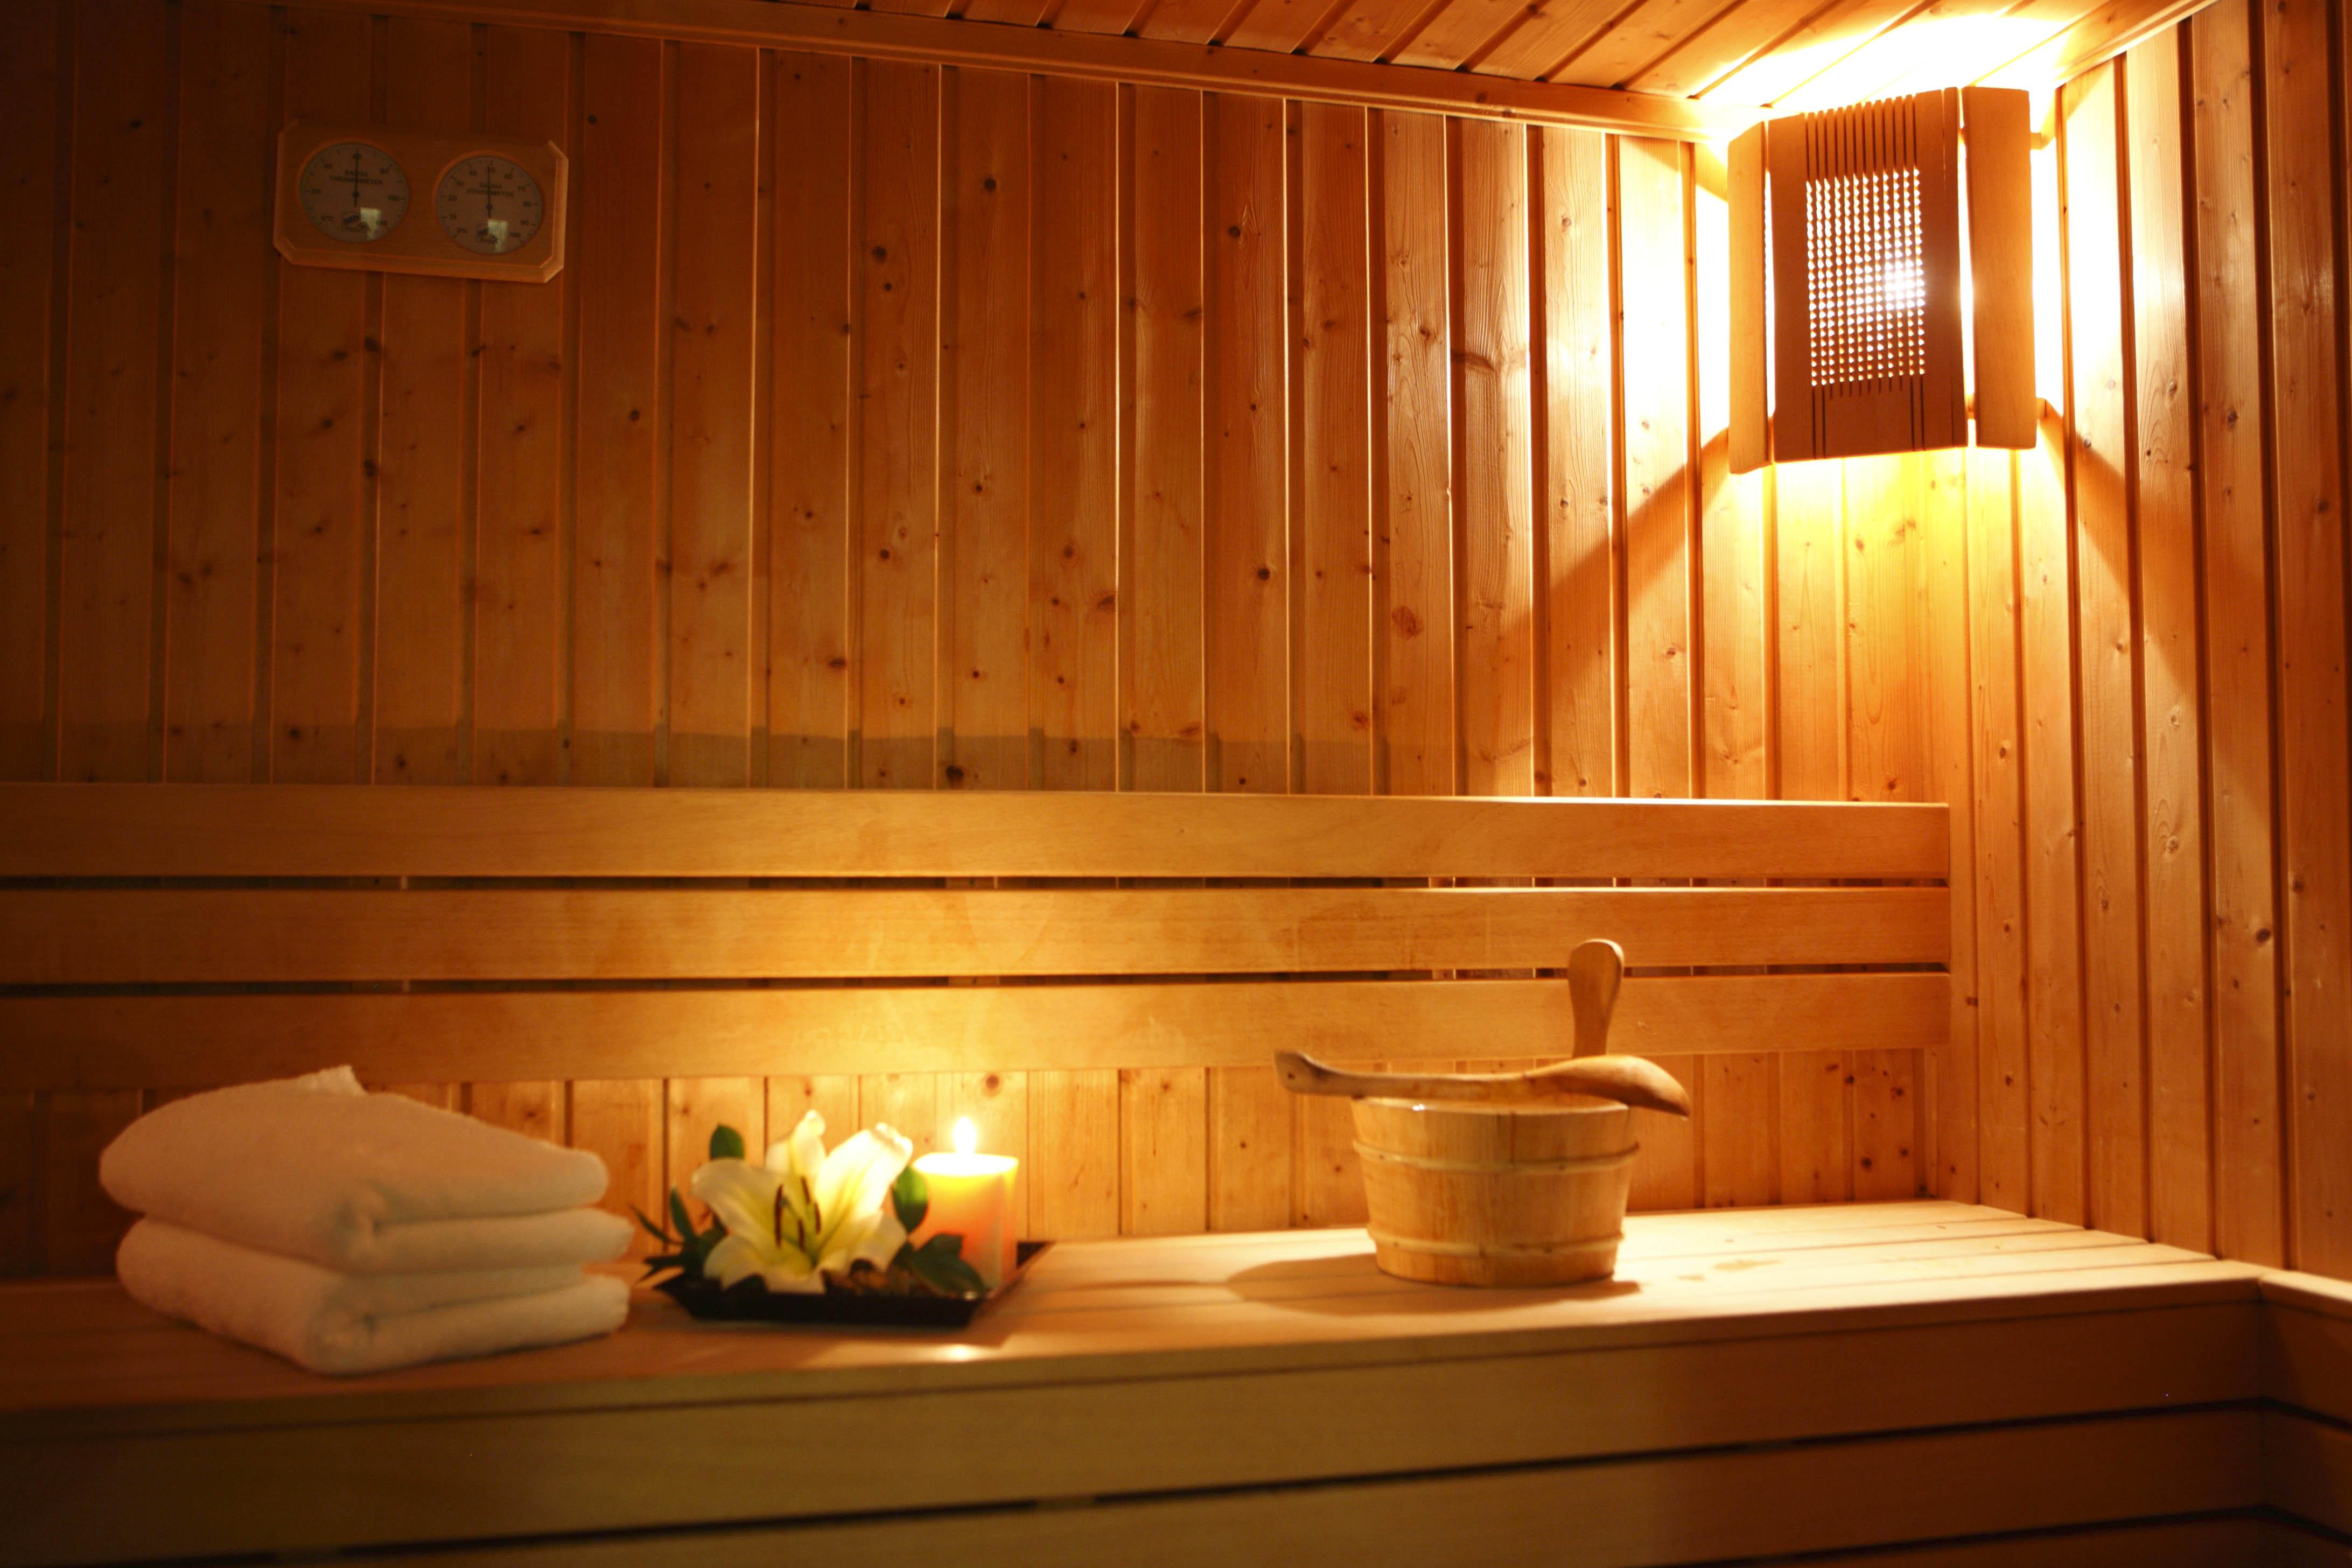 Технические нюансы вентиляции в бане